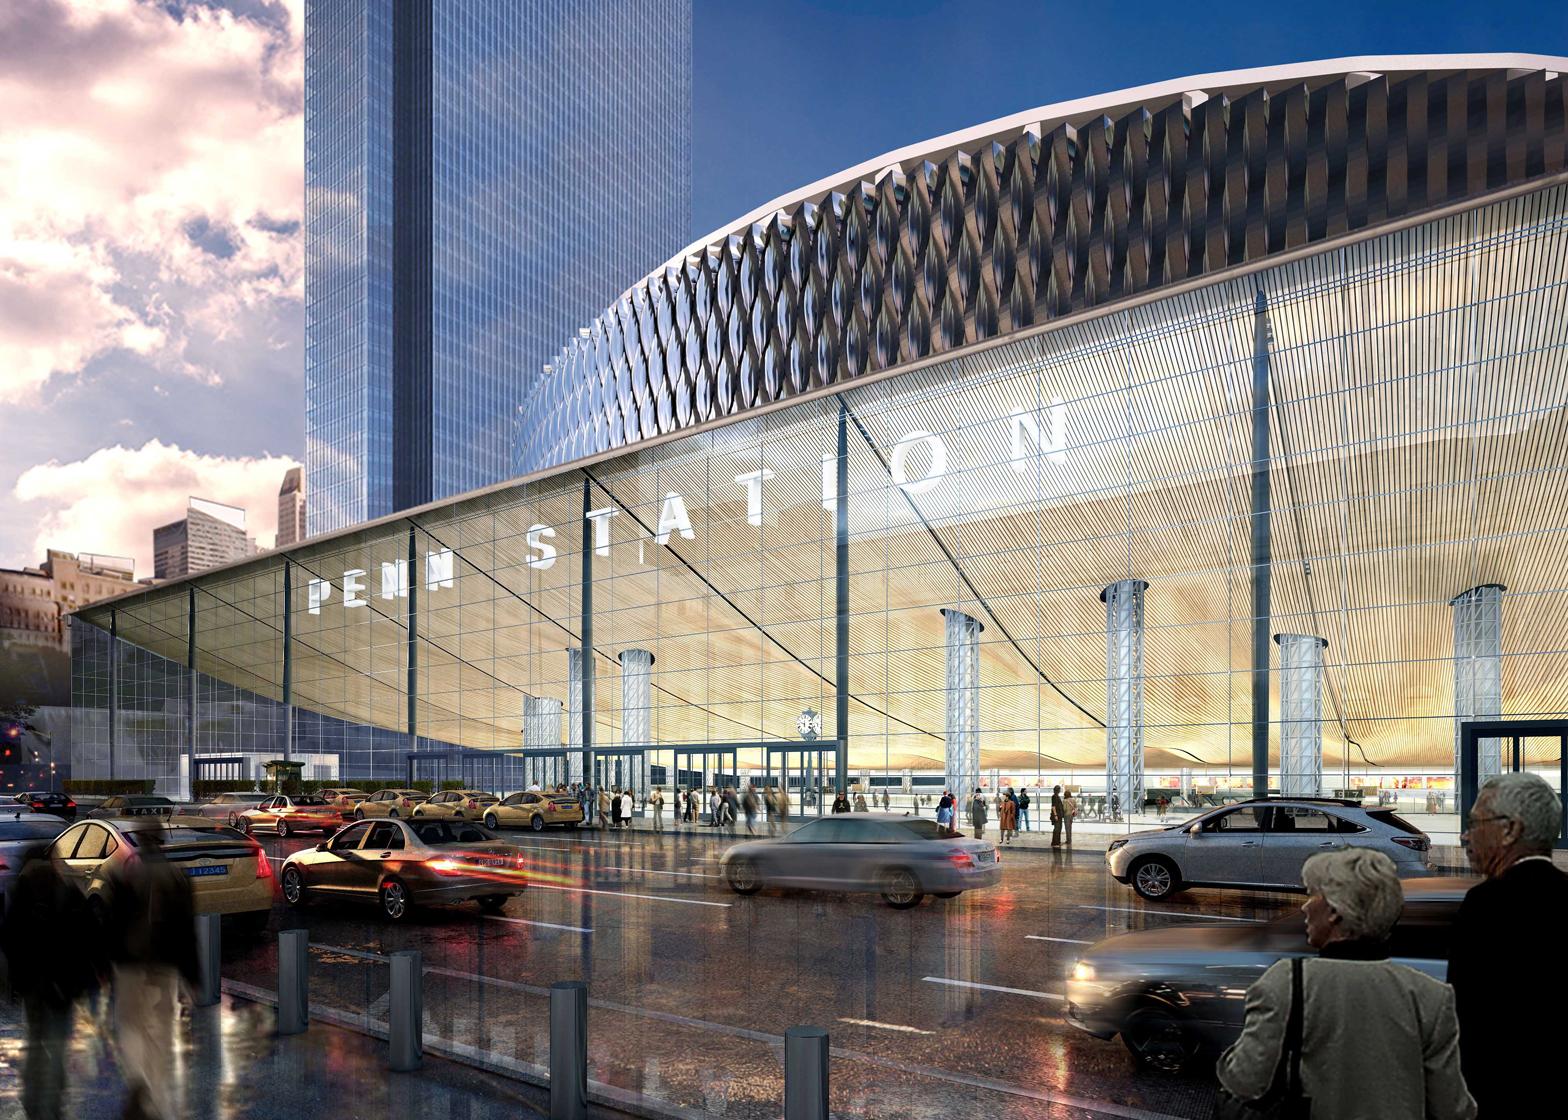 Governor Cuomo Announces New Penn Station Private-Public Partnership RFP